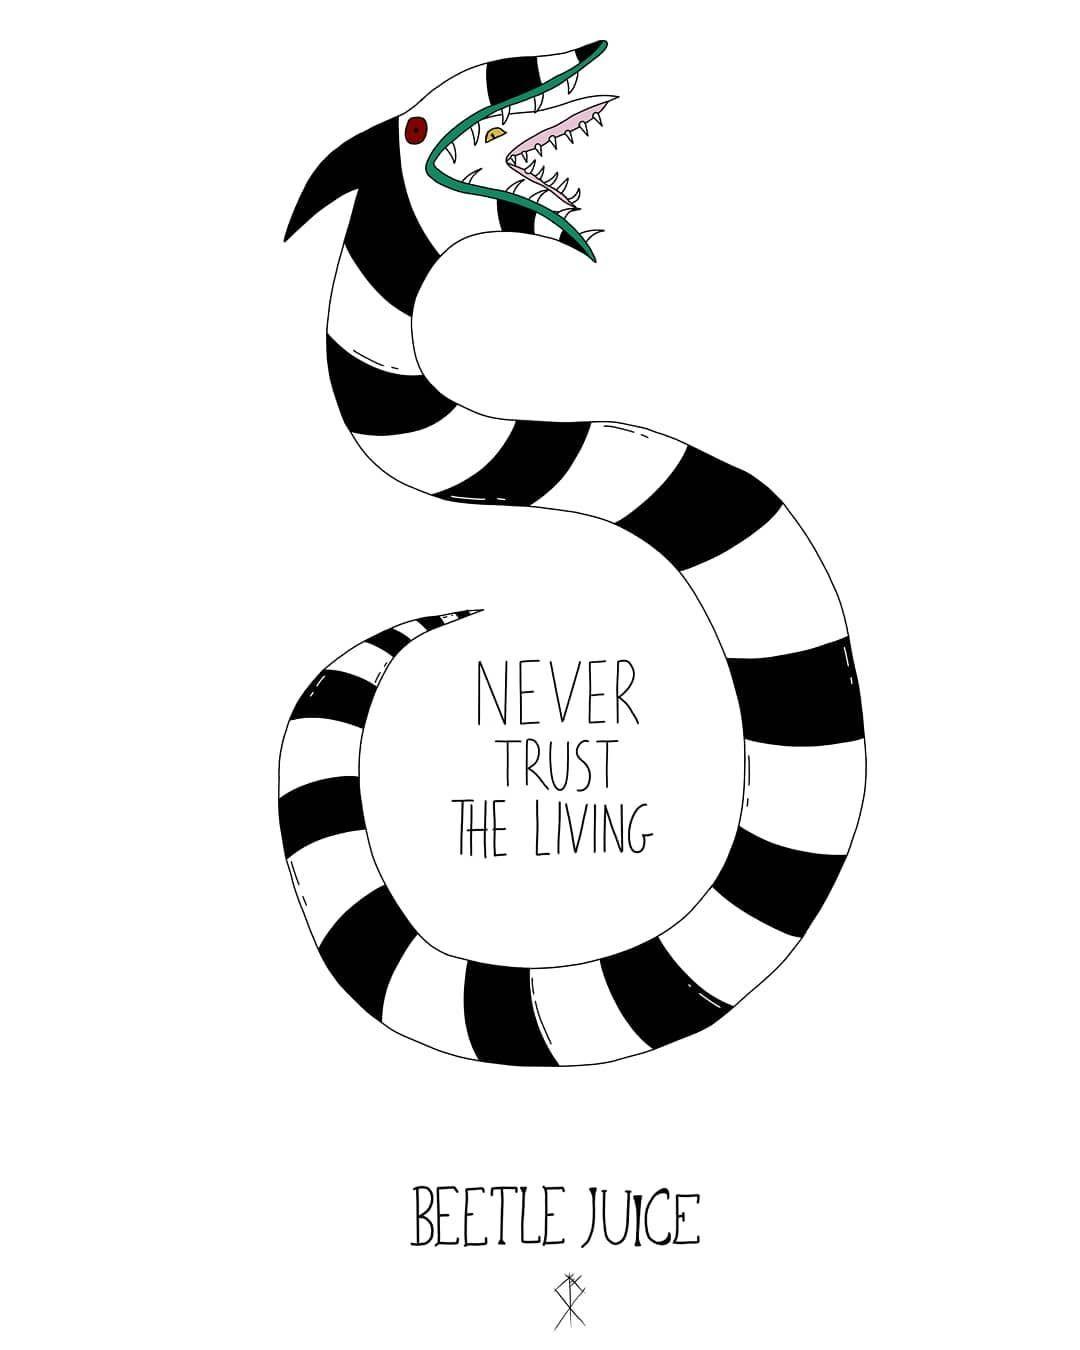 𝕭𝖊𝖊𝖙𝖑𝖊 𝕵𝖚𝖎𝖈𝖊 𝕾𝖓𝖆𝖐𝖊 Drawing Blackwolfsad Macabre Darkness Logo Darkart Artwor Beetlejuice Tattoo Beetlejuice Beetlejuice Sandworm